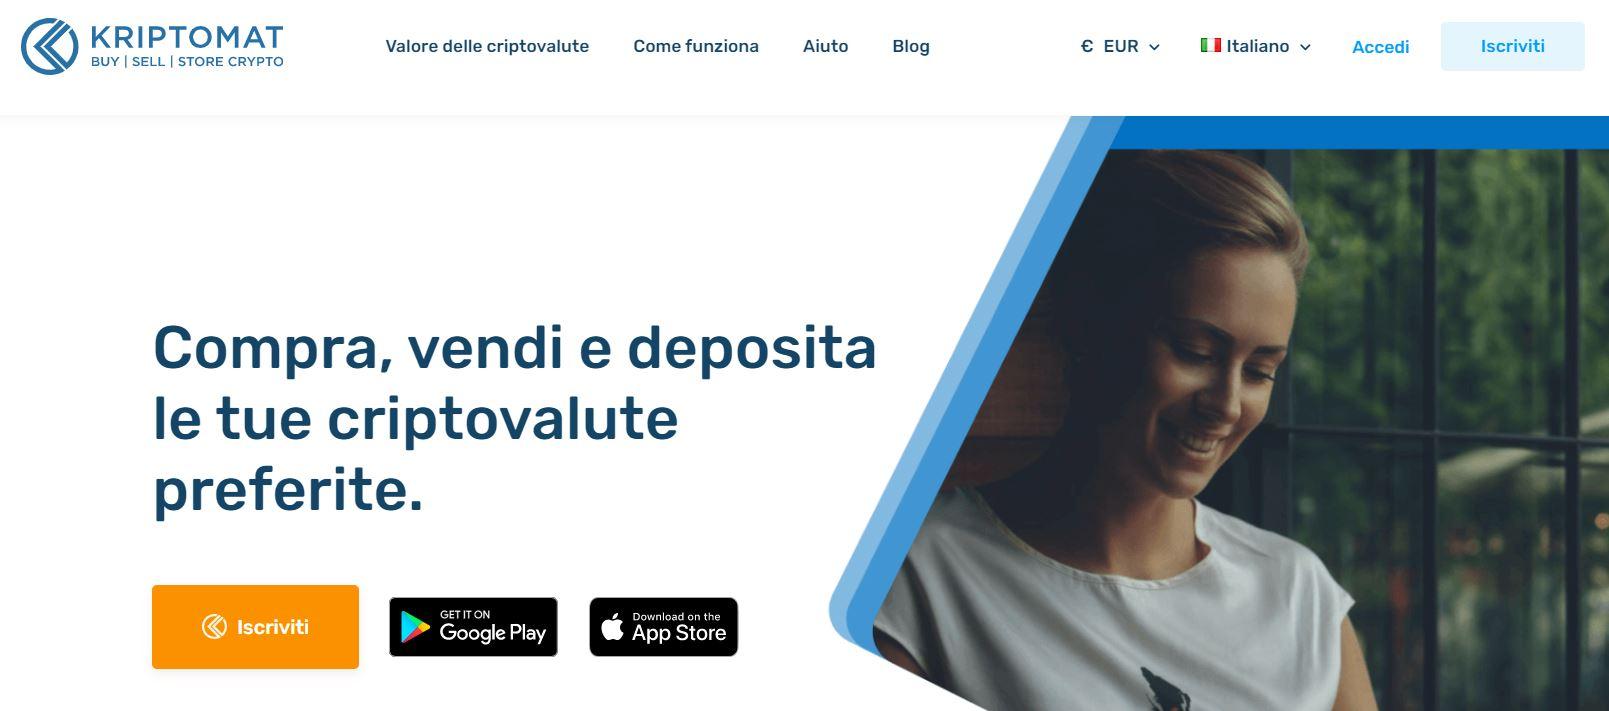 piattaforma exchange criptovalute